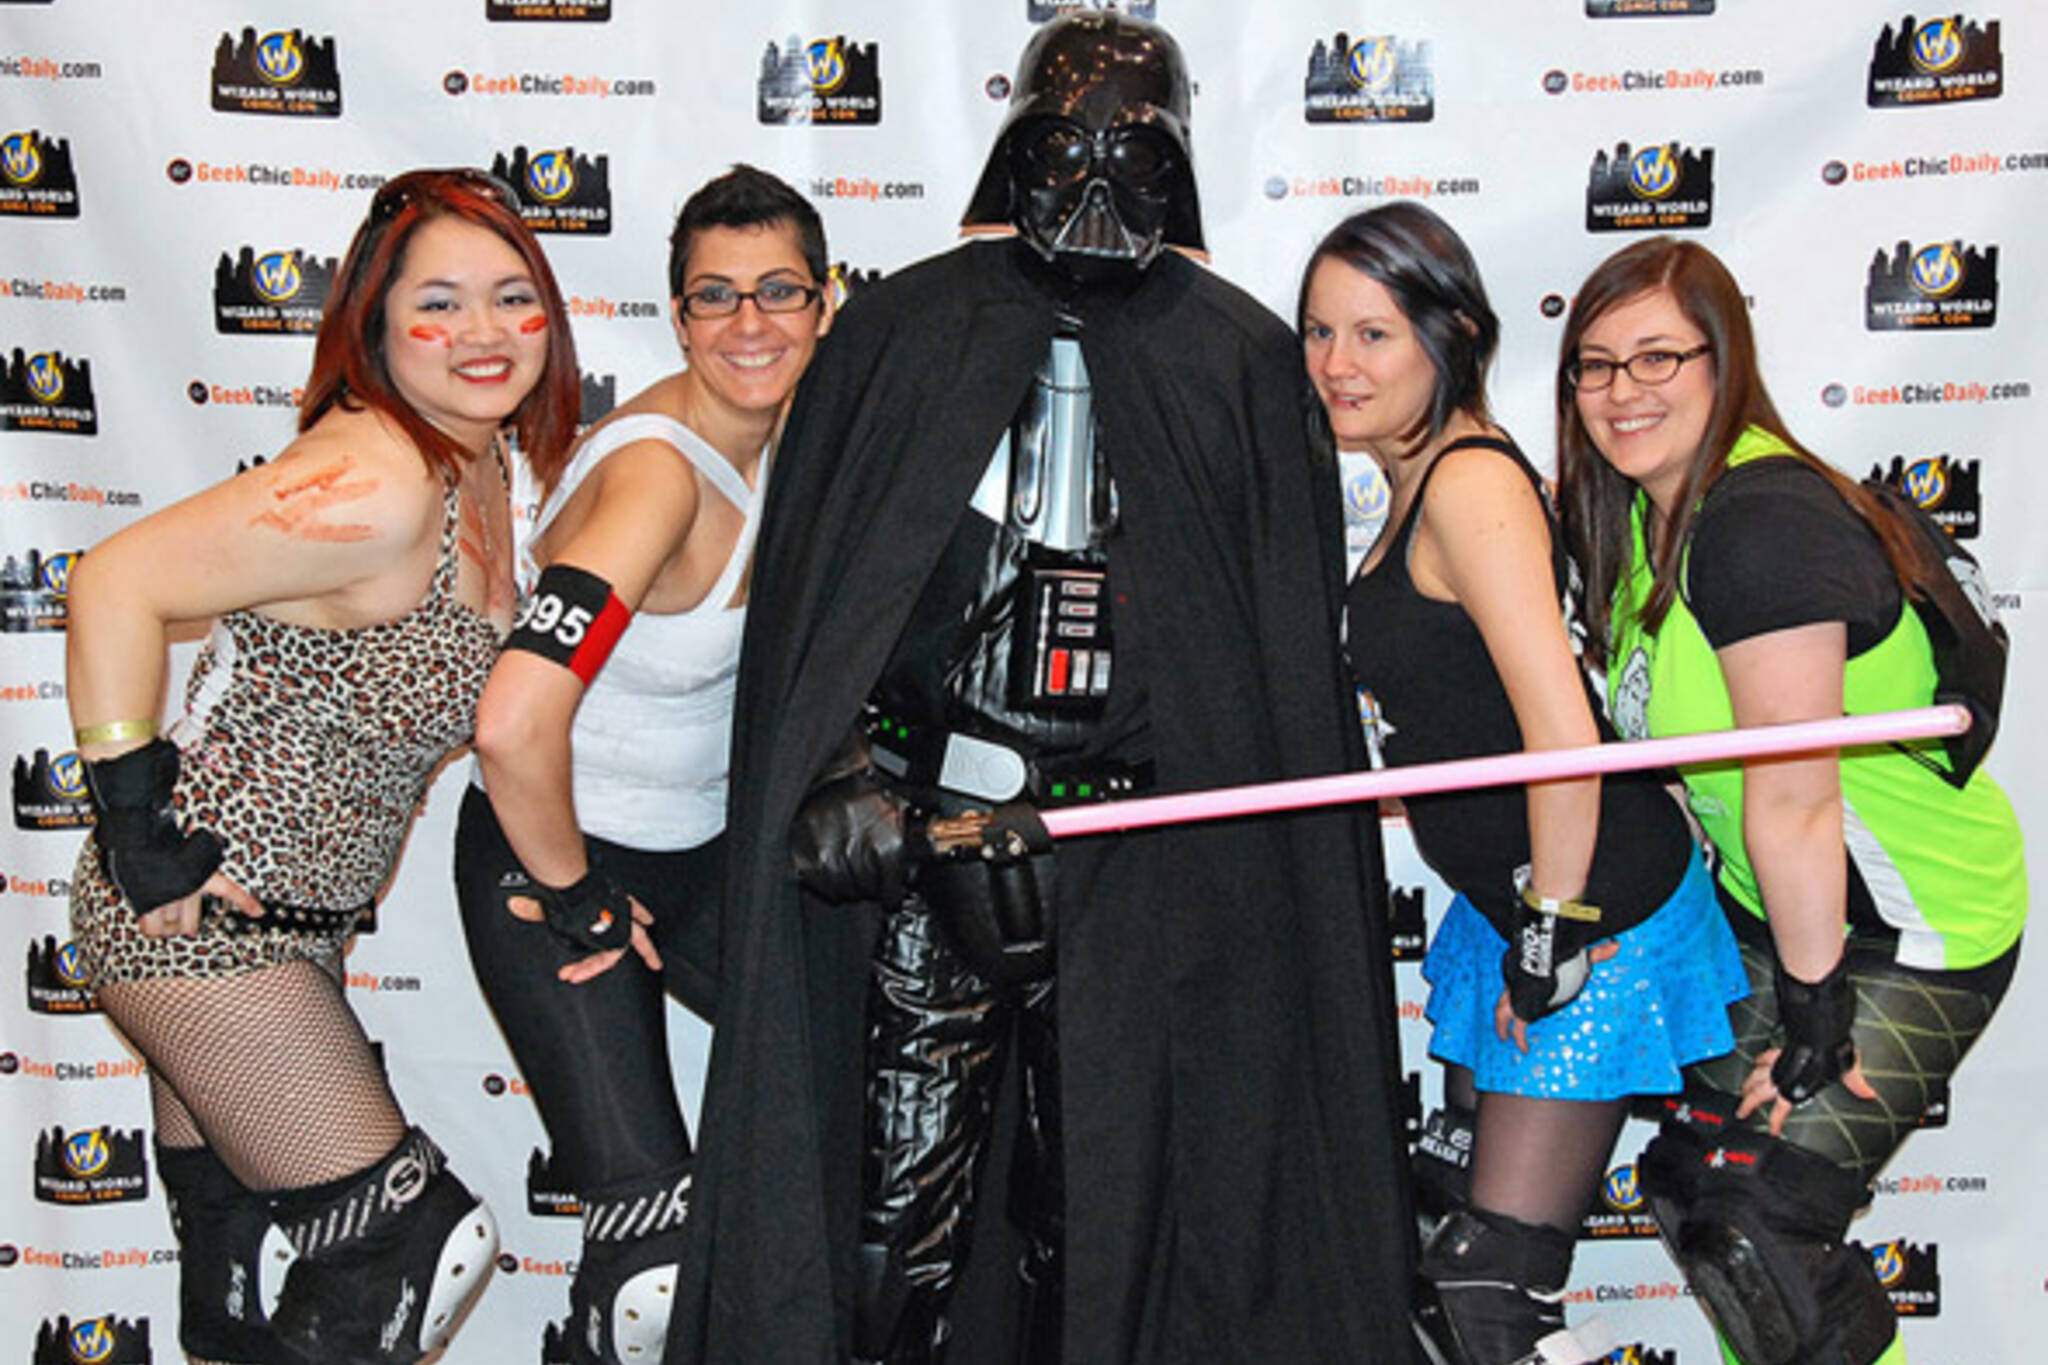 Comic Con Toronto 2011